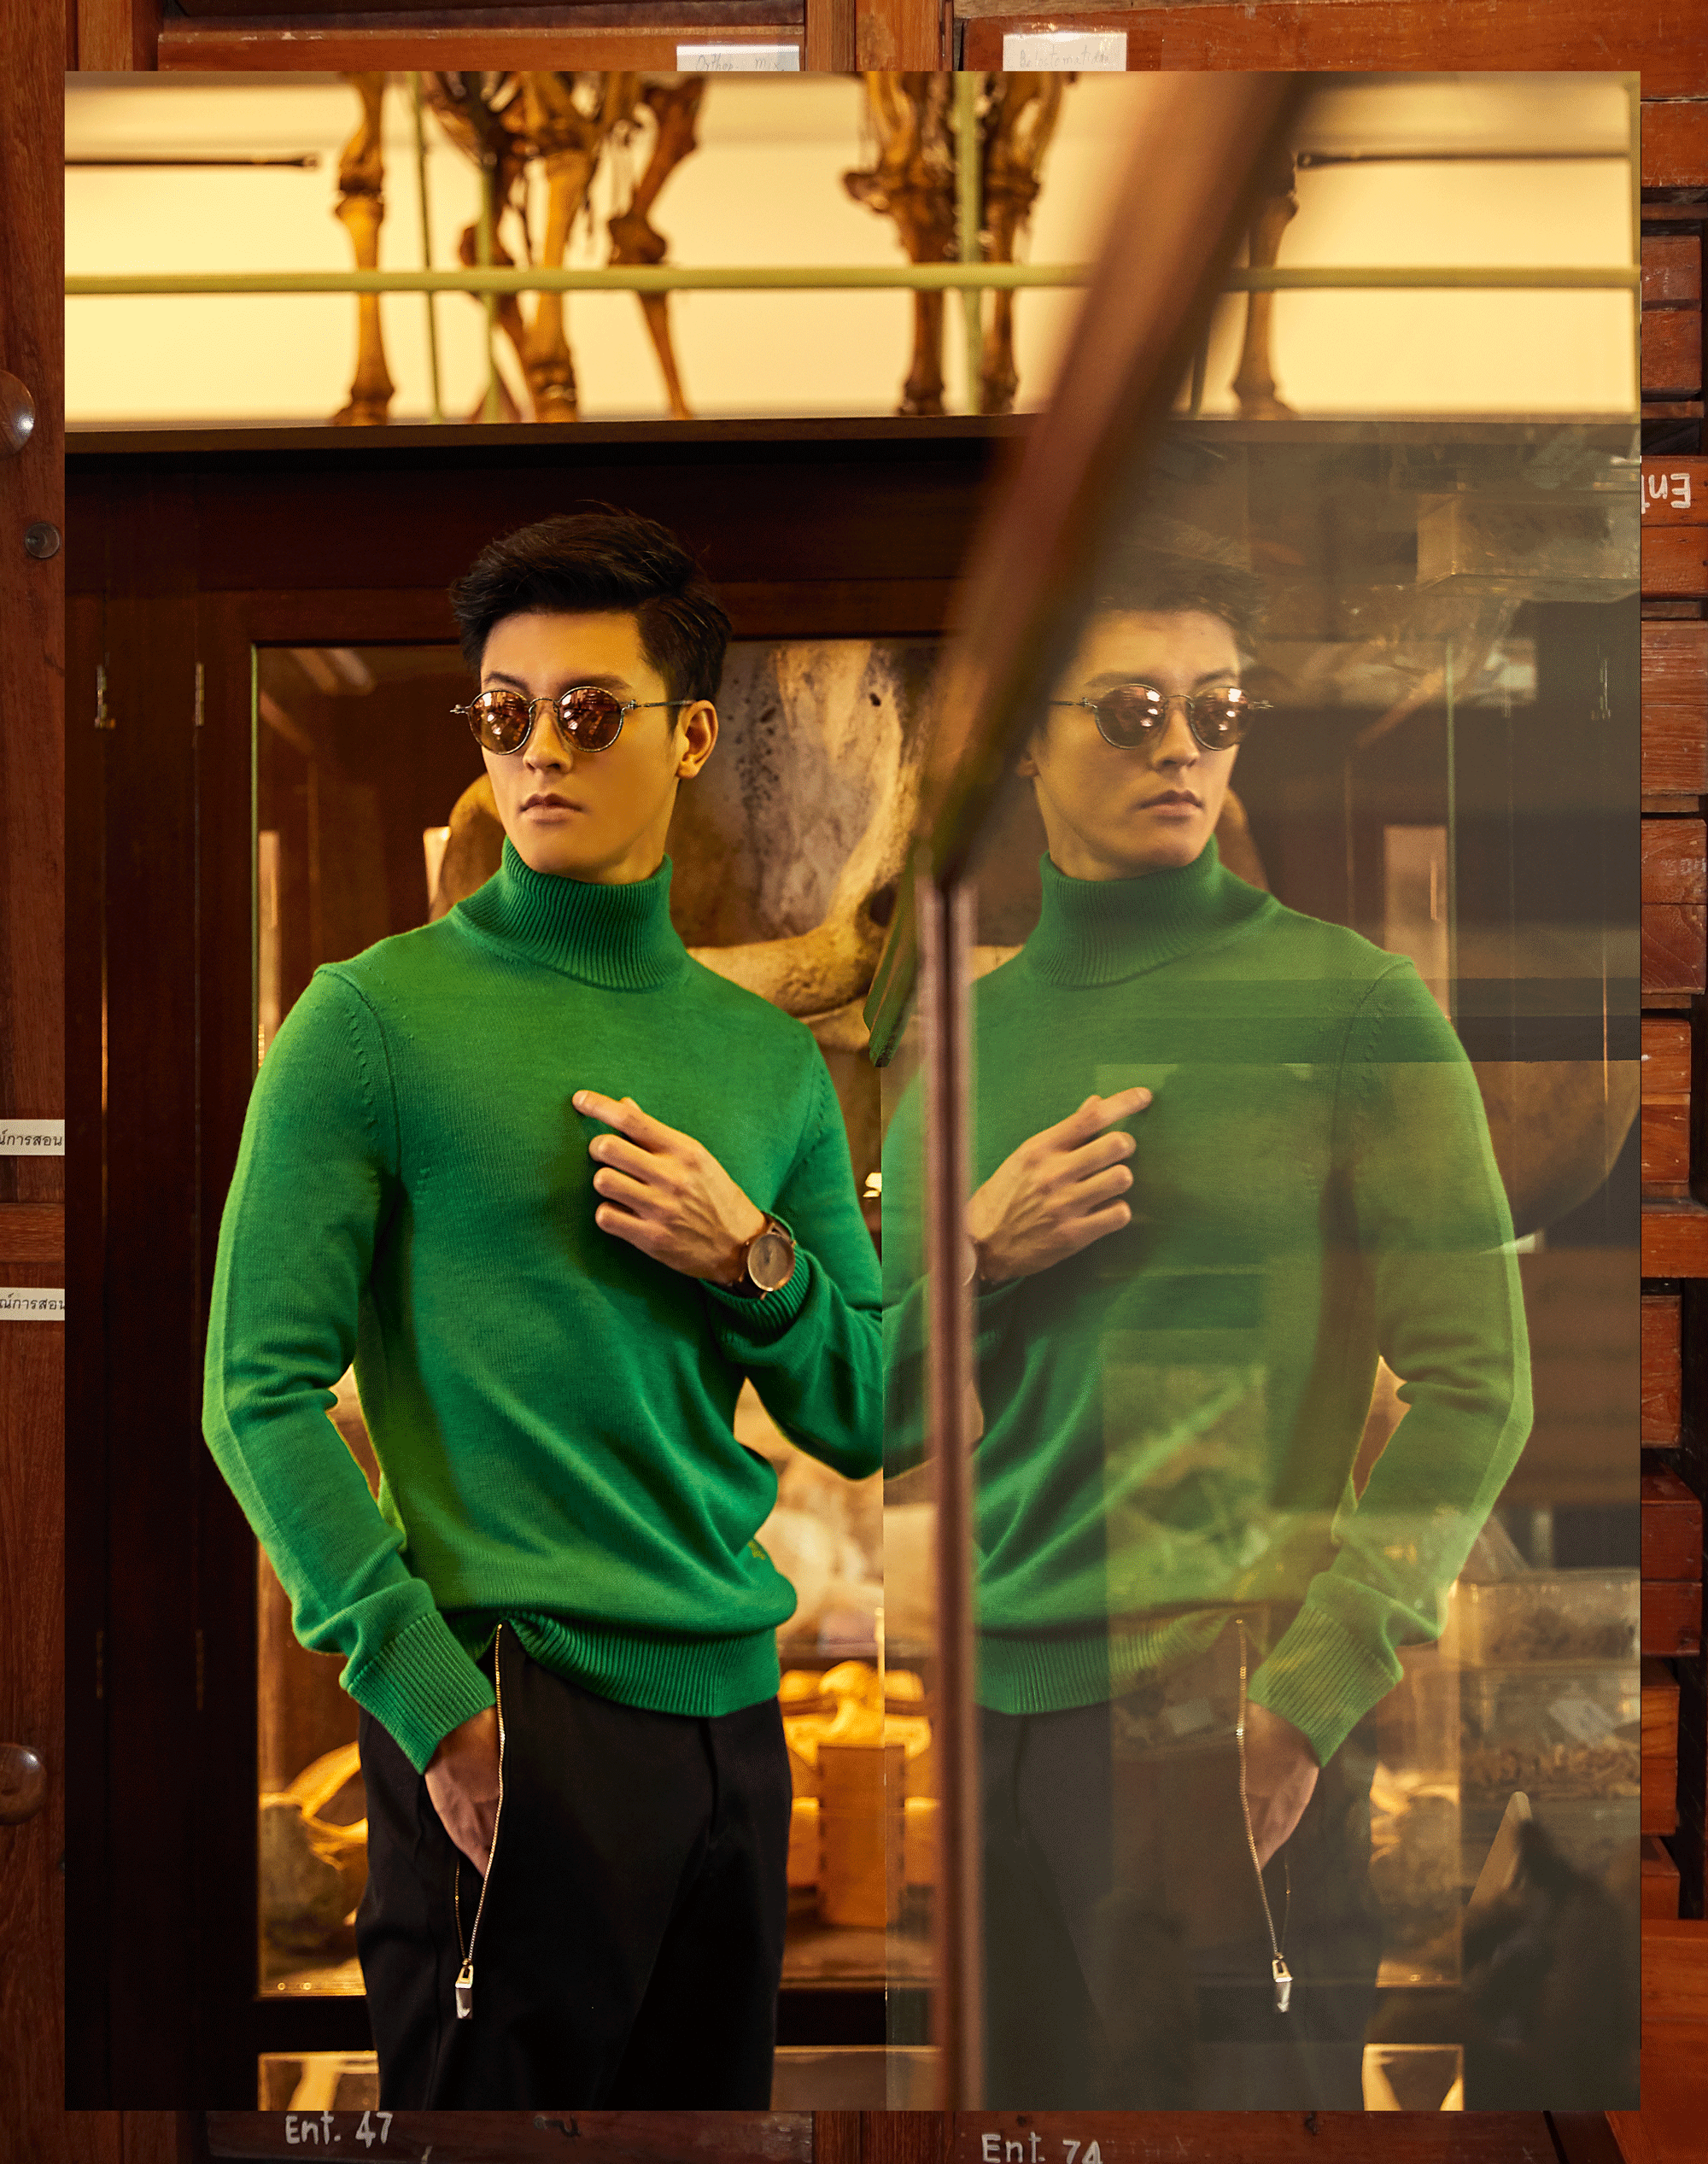 sweater : CK Calvin Klein / pants : Emporio Armani / sunglasses : TAVAT / watch : FORREST